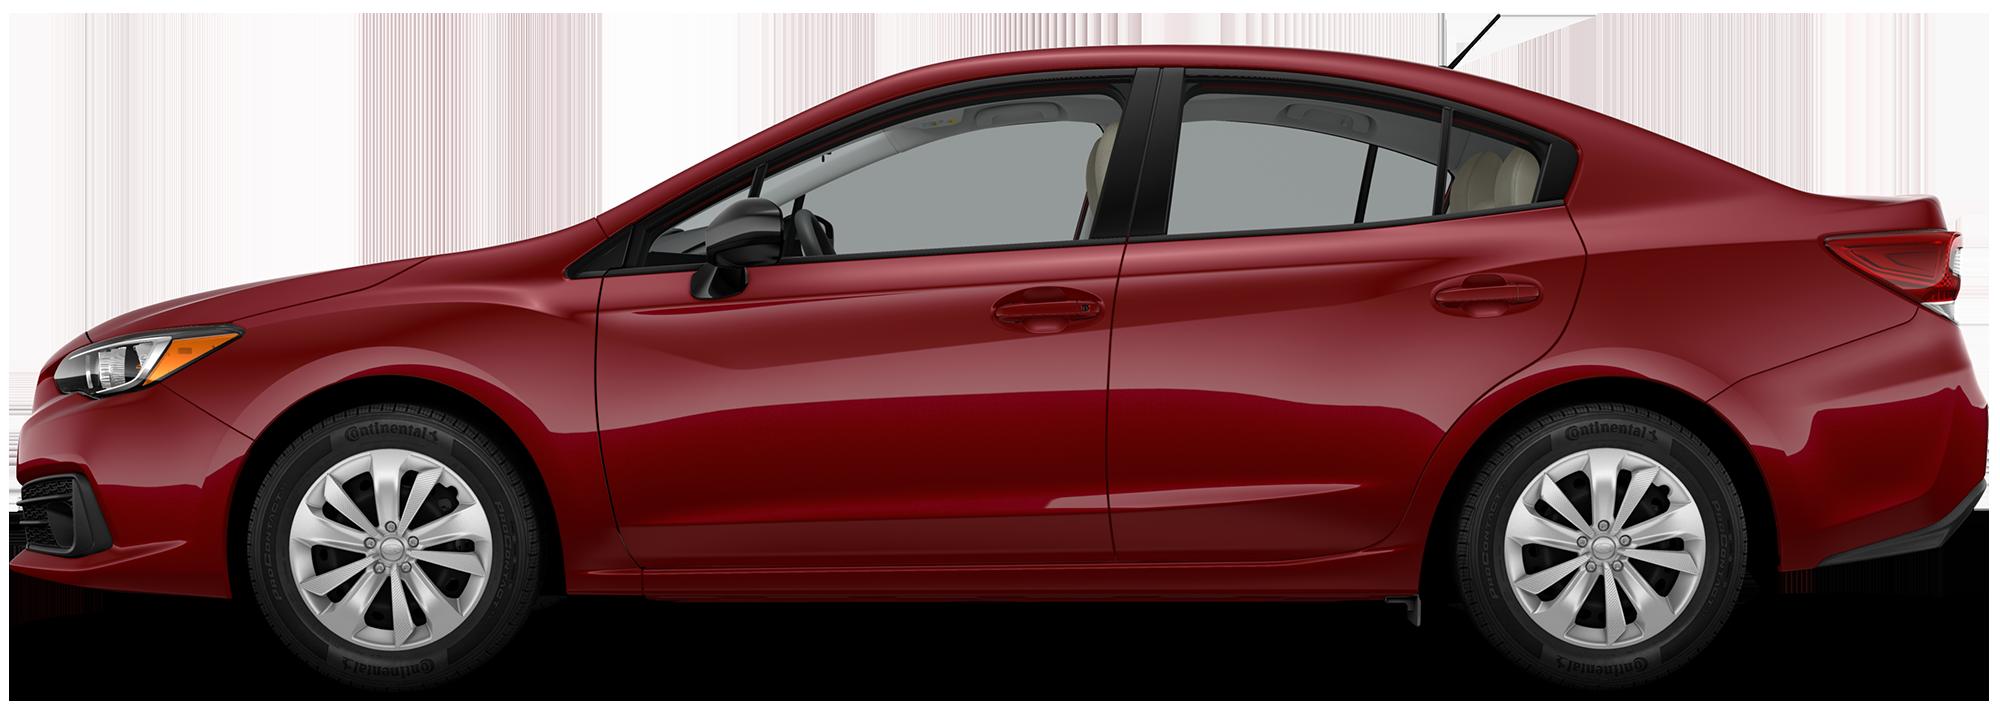 2022 Subaru Impreza Sedan Base Trim Level